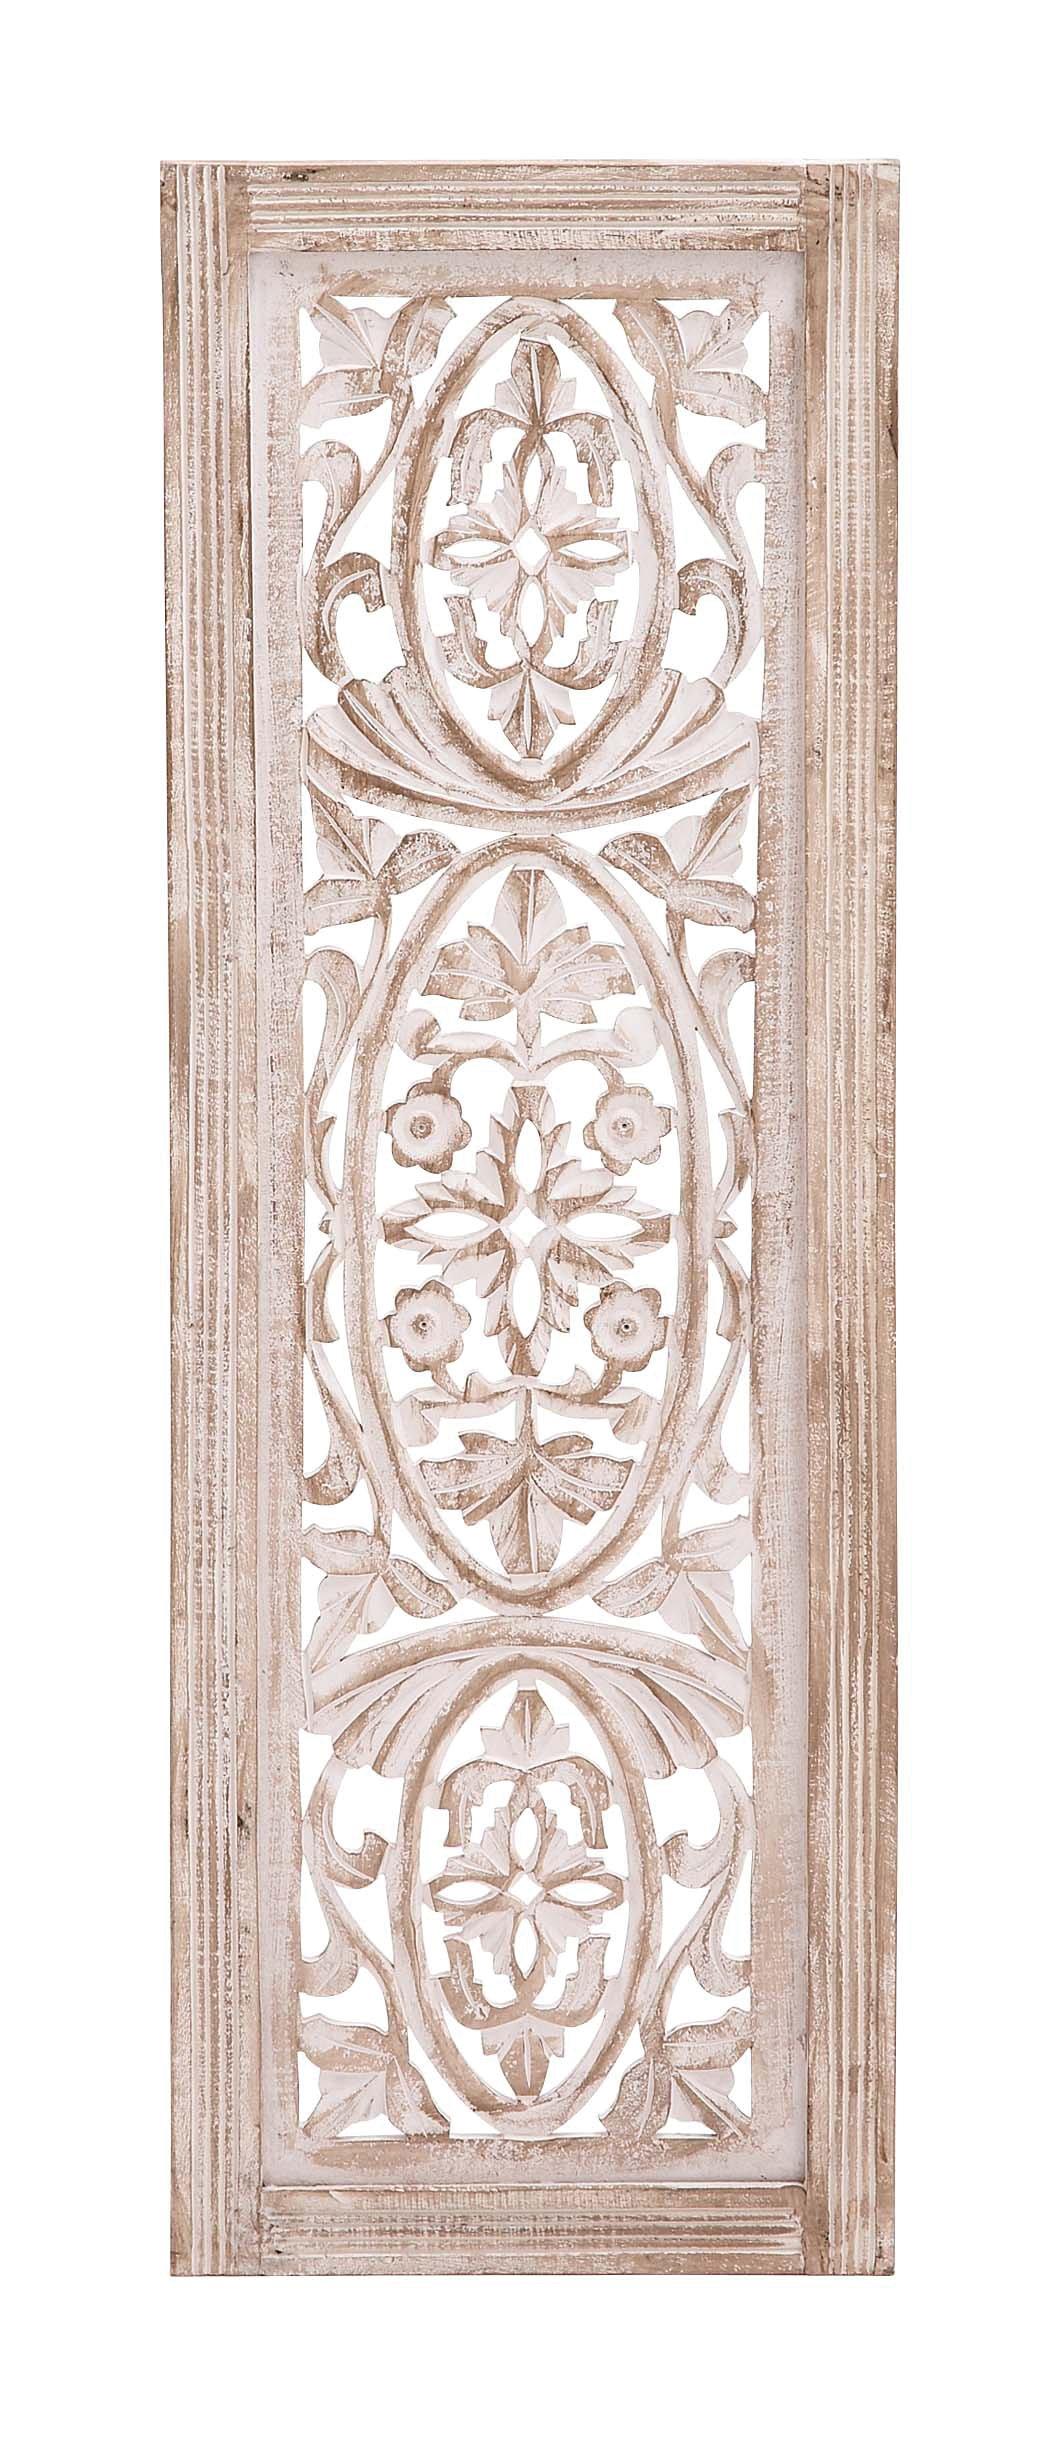 Decorative Wall Panels For Living Room: Decorative Wall Panels: Amazon.com